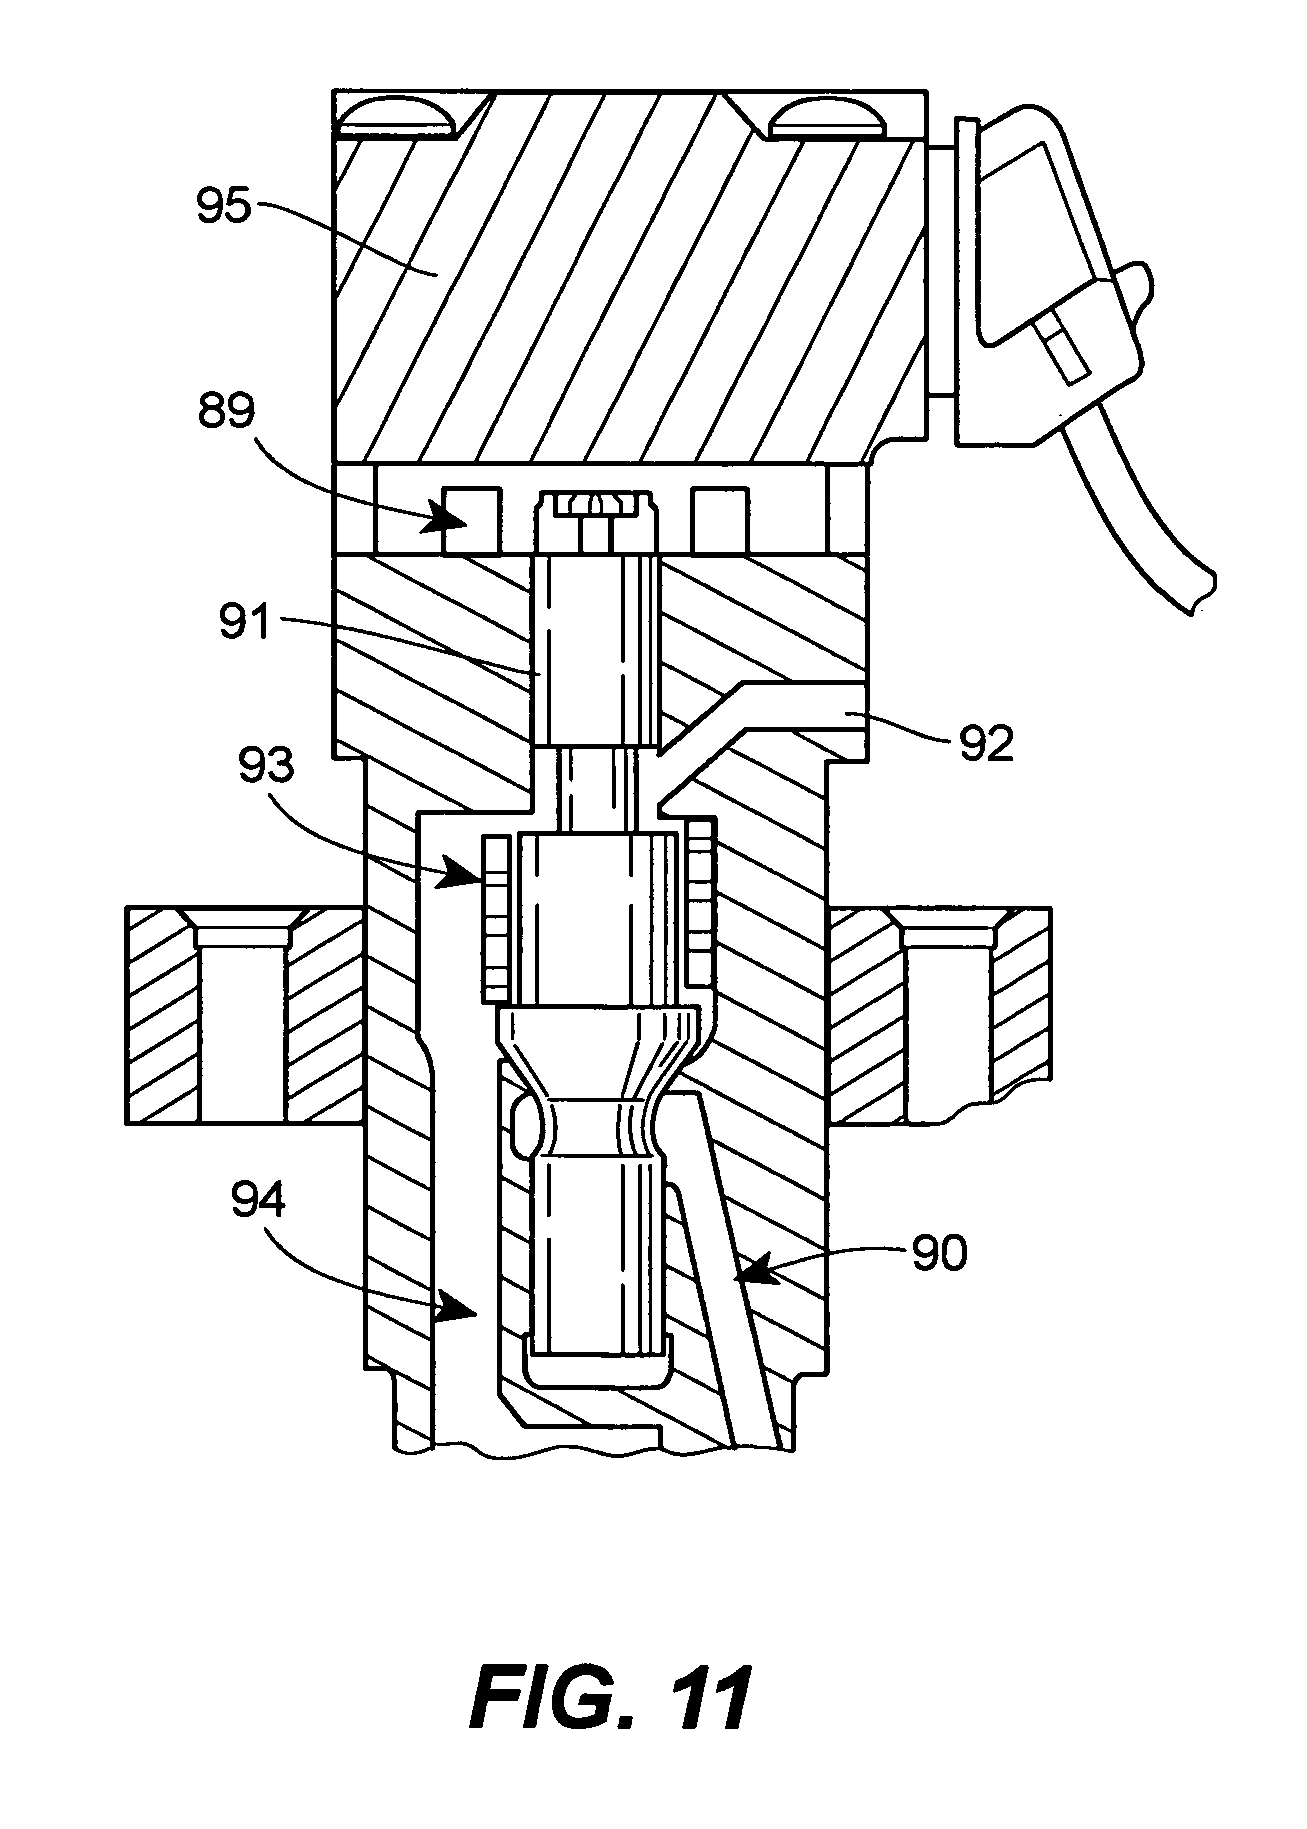 miller cycle engine diagram 1999 patent us7347171 - engine valve actuator providing miller ... tecumseh 2 cycle engine diagram #14